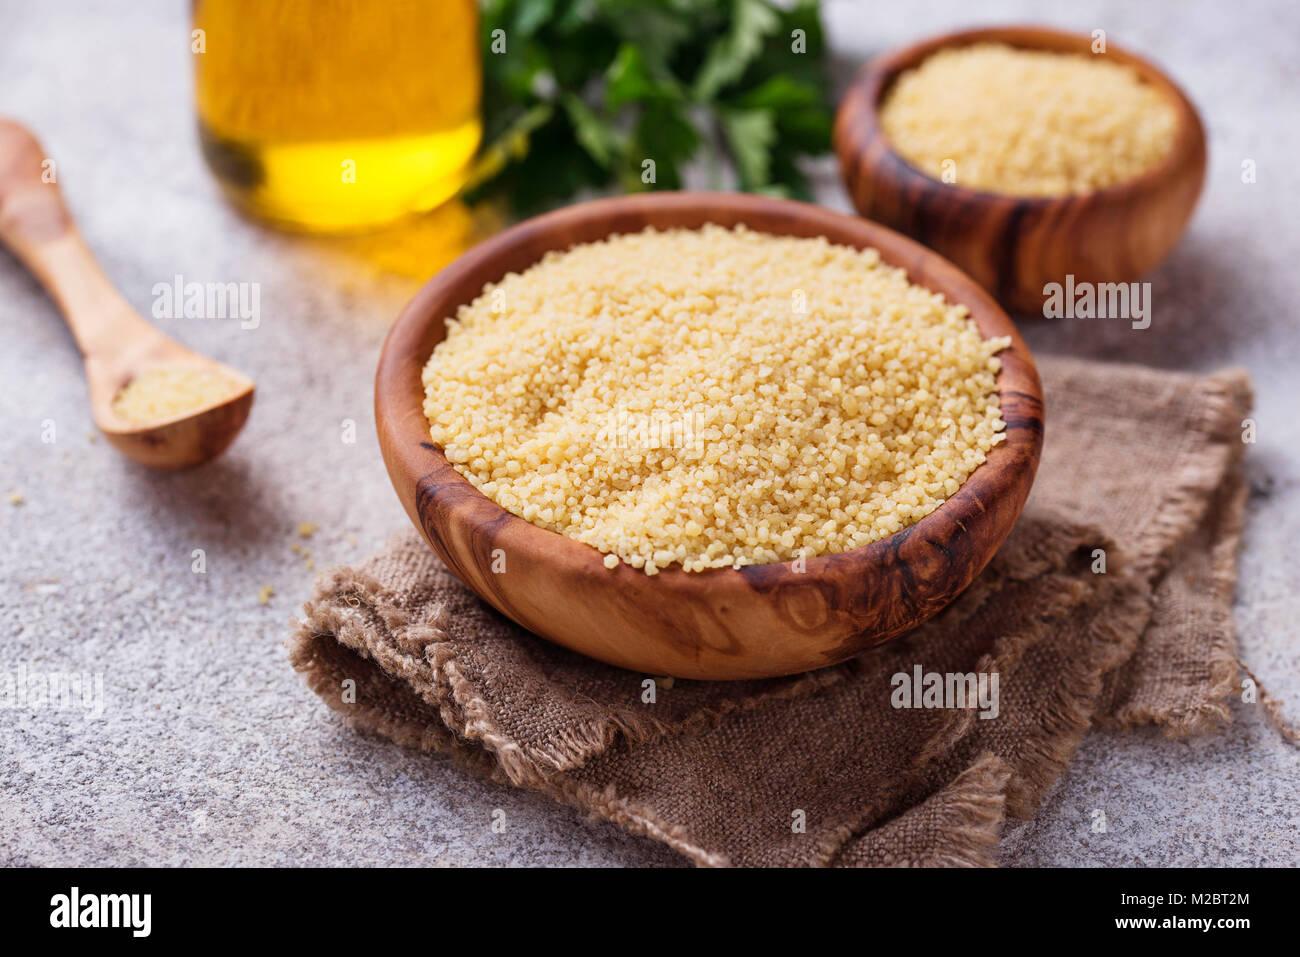 Couscous grain in wooden bowl  - Stock Image